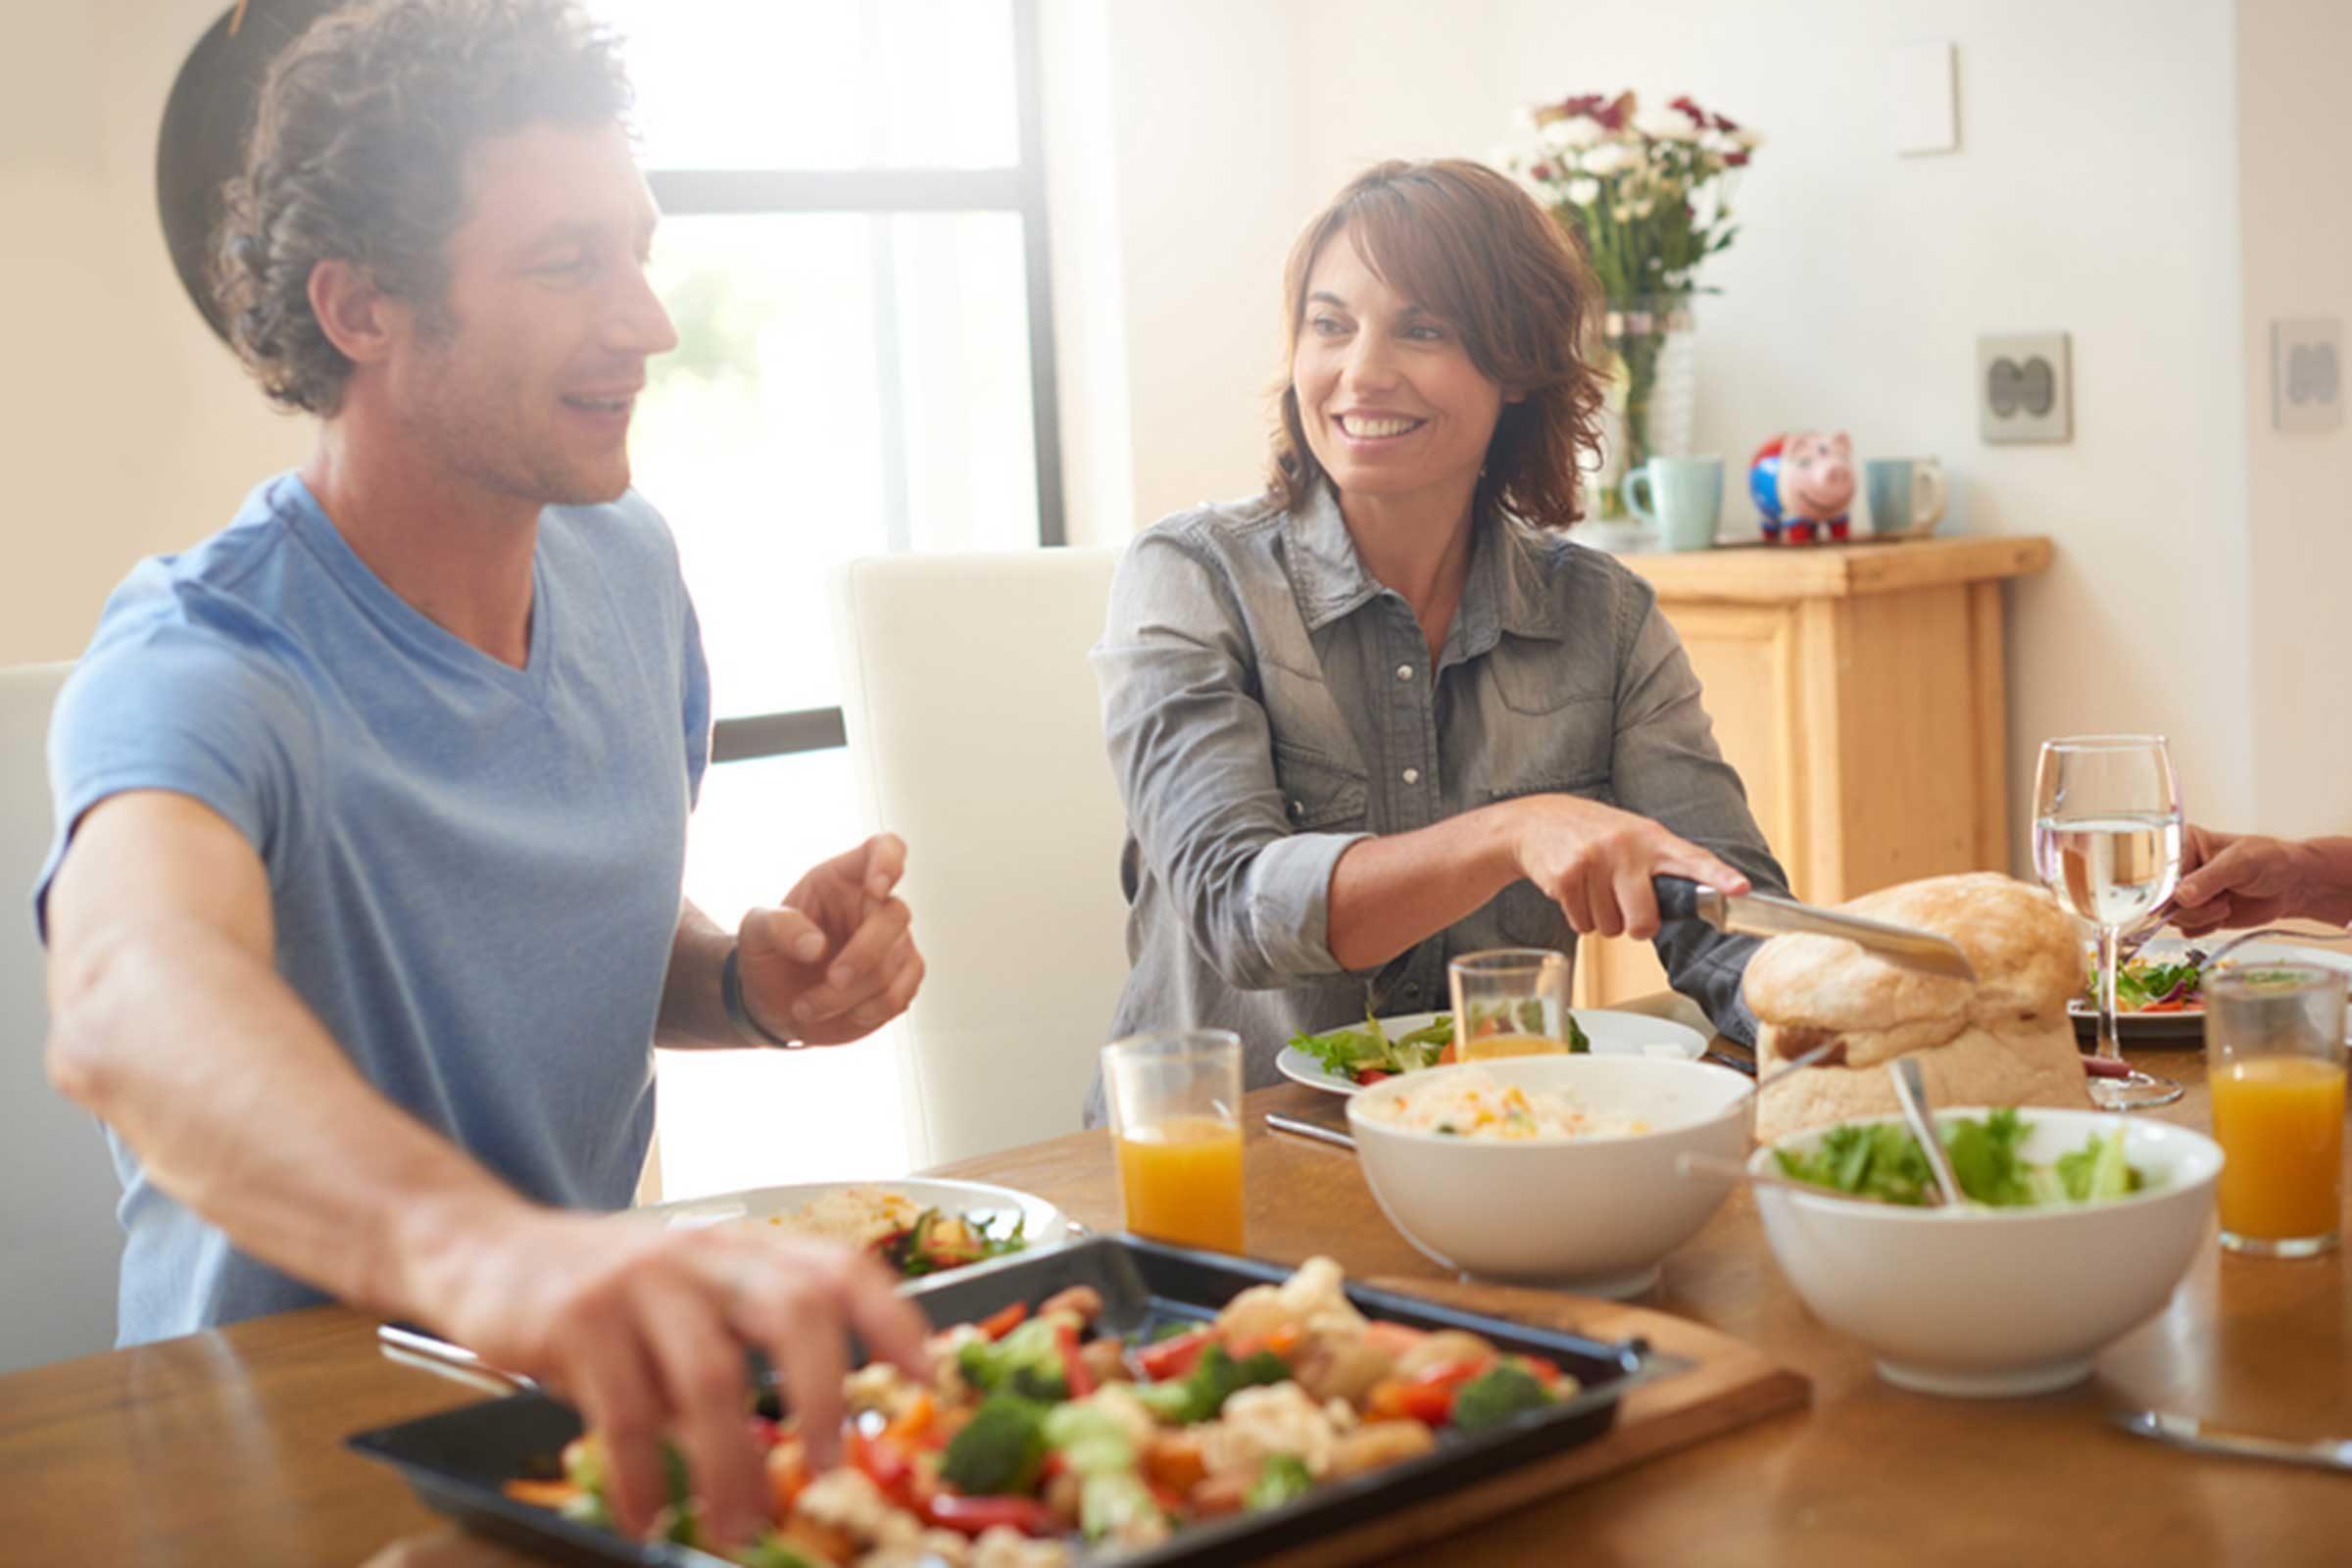 Man and woman eating at table